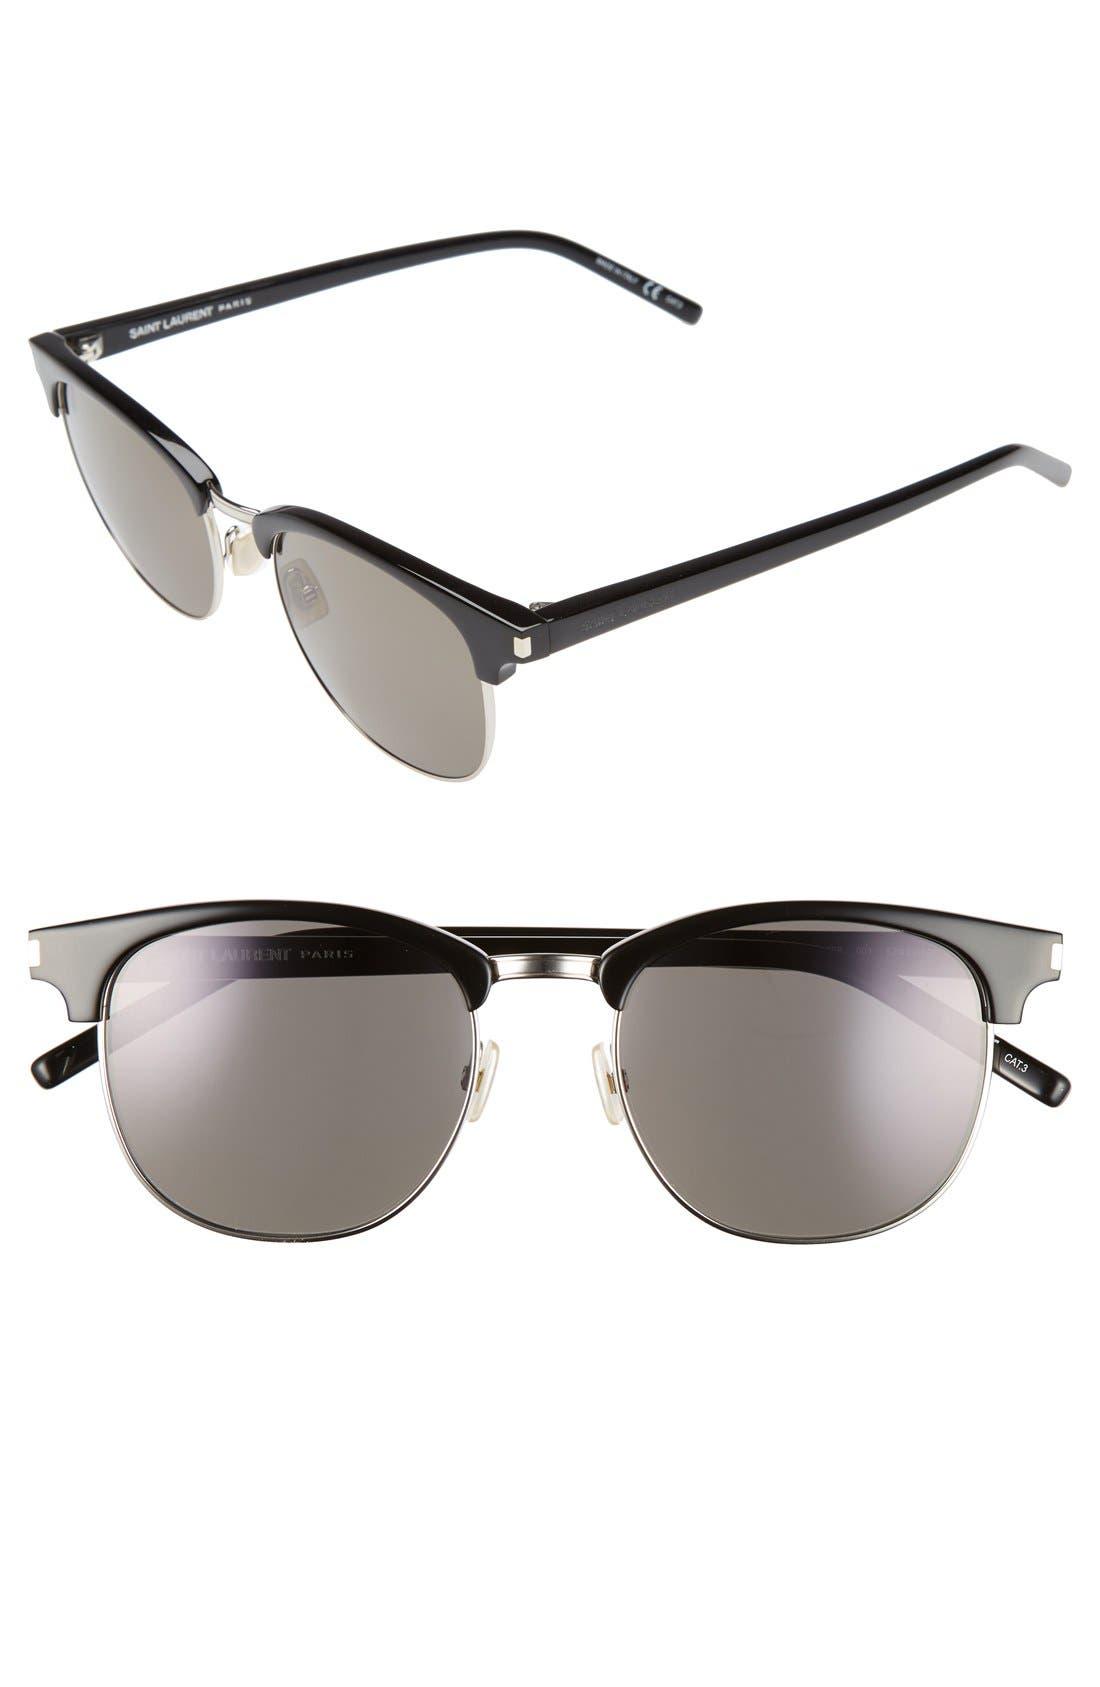 Main Image - Saint Laurent 52mm Sunglasses